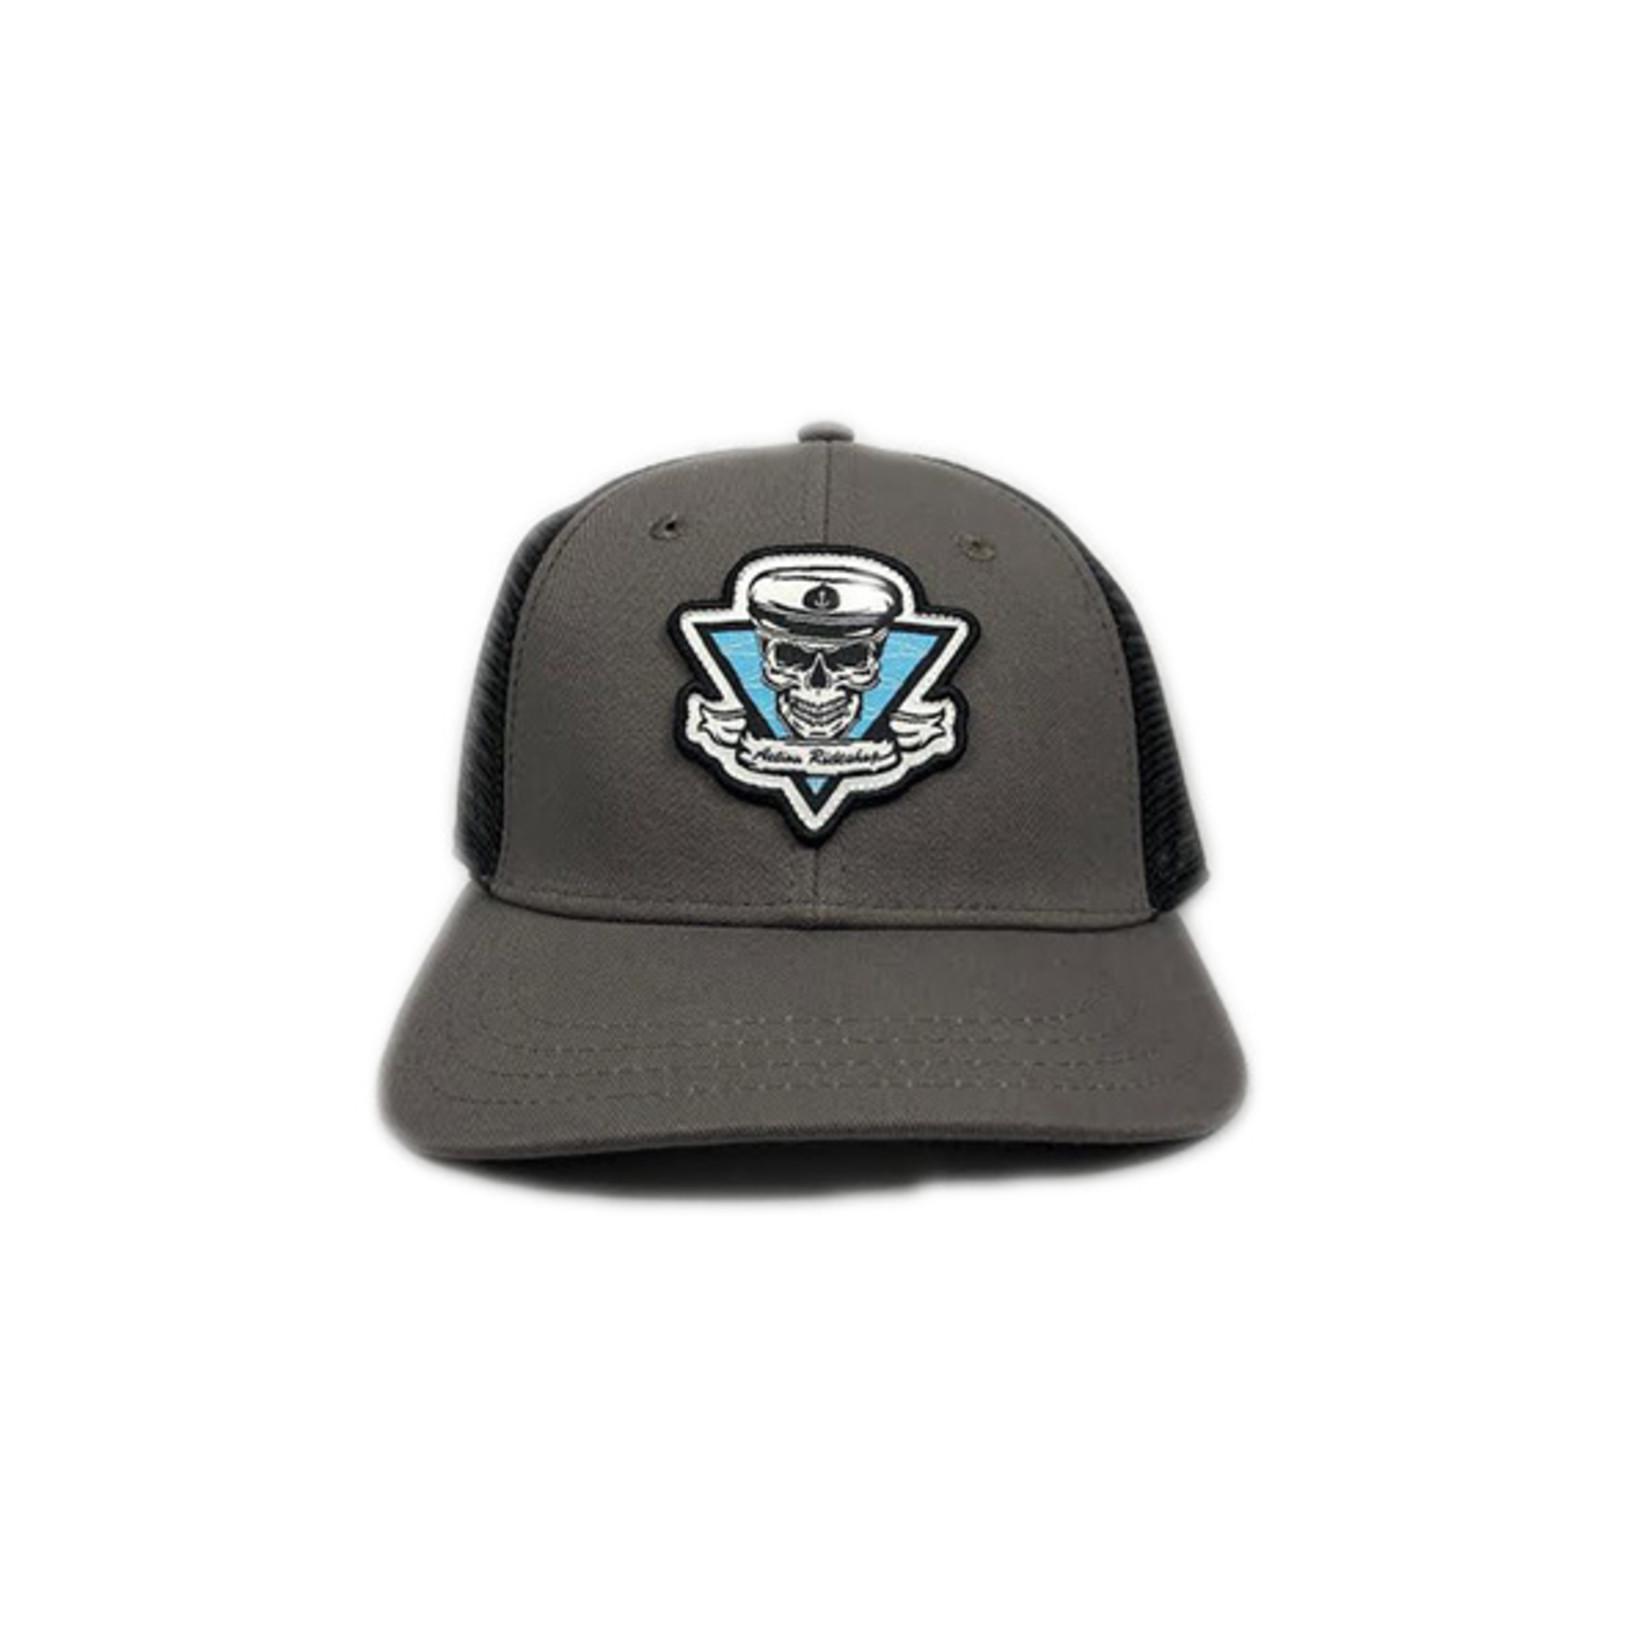 Action Rideshop Captain Booty Hat